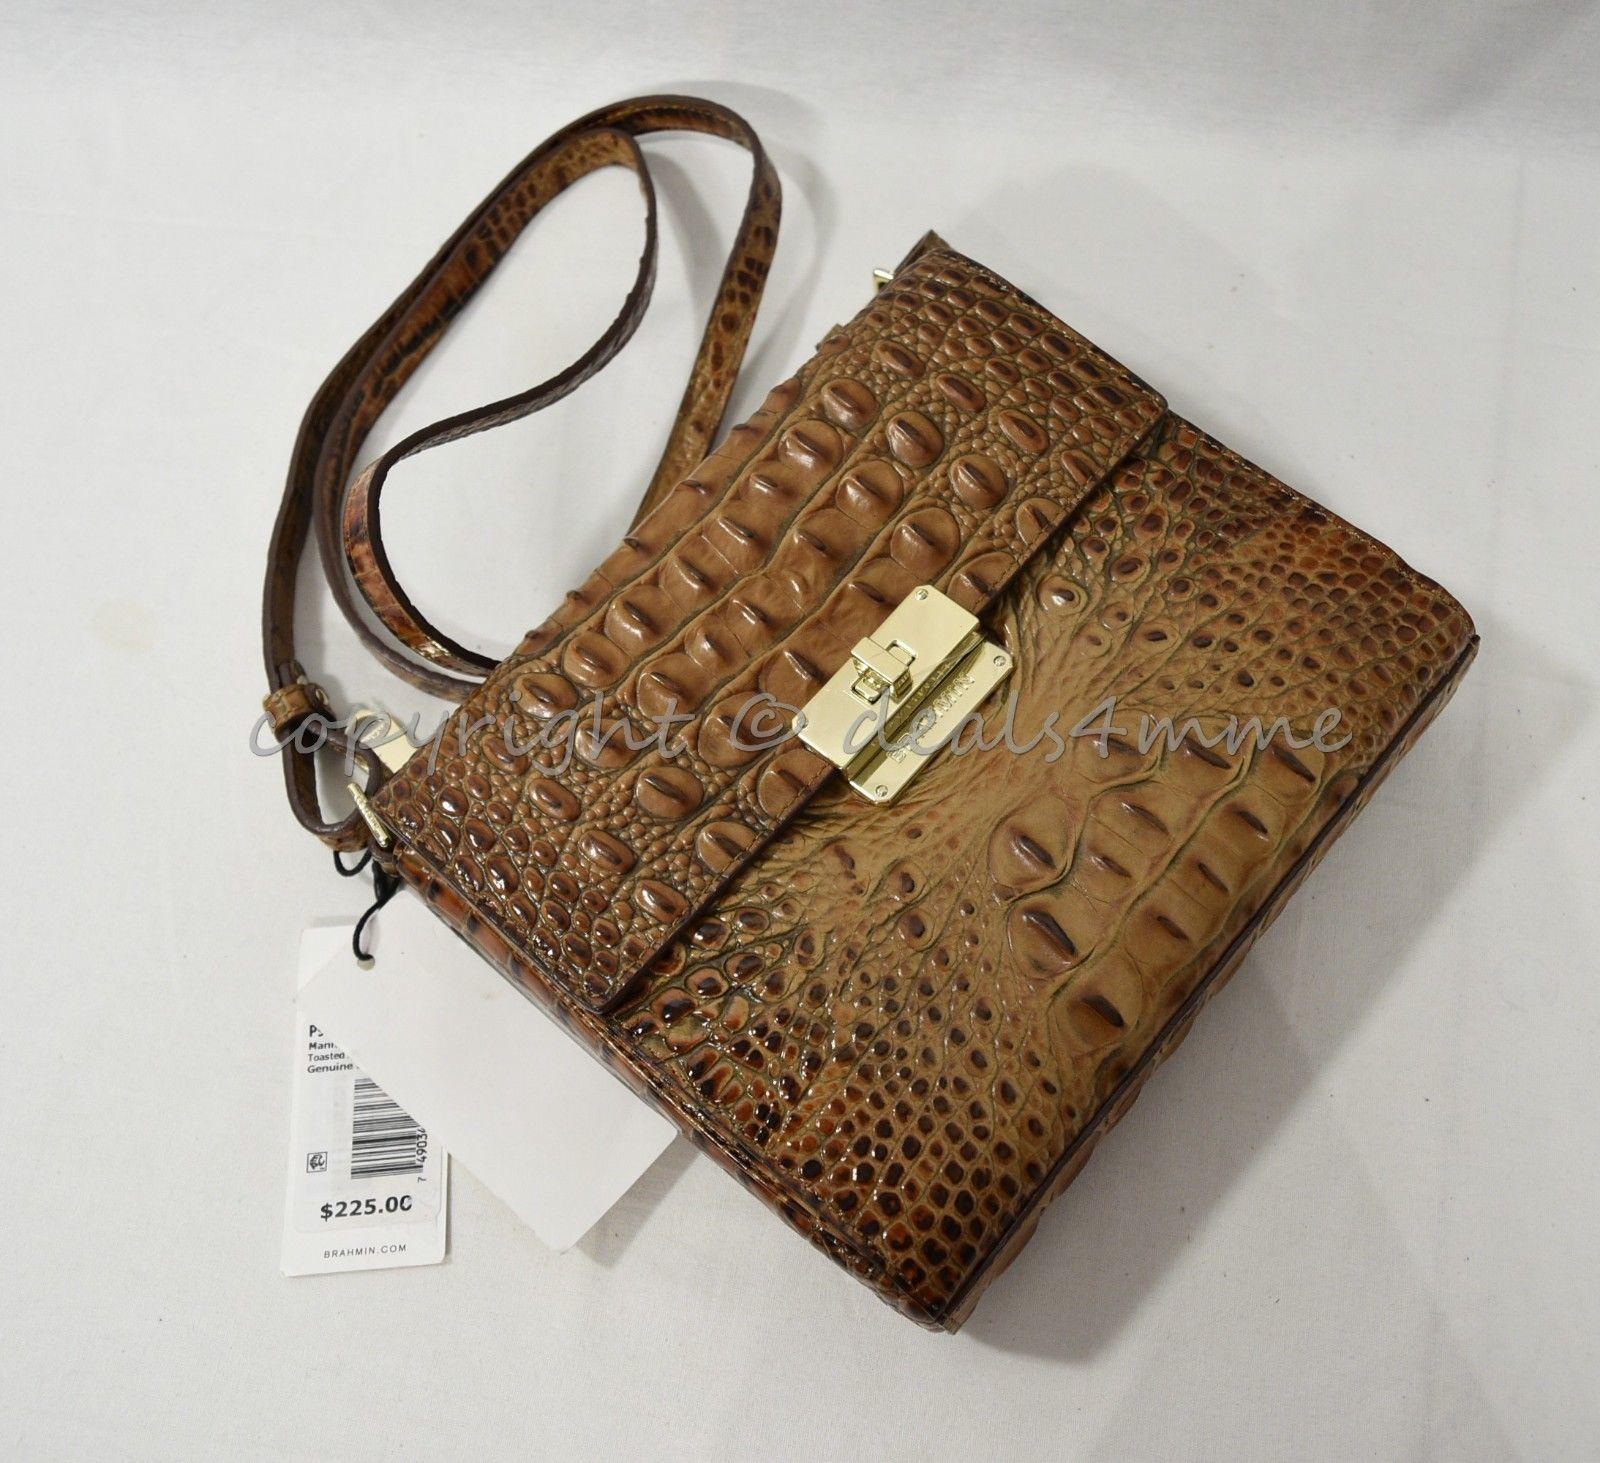 NWT Brahmin Manhattan Leather Shoulder/Crossbody Bag in Toasted Almond Melbourne